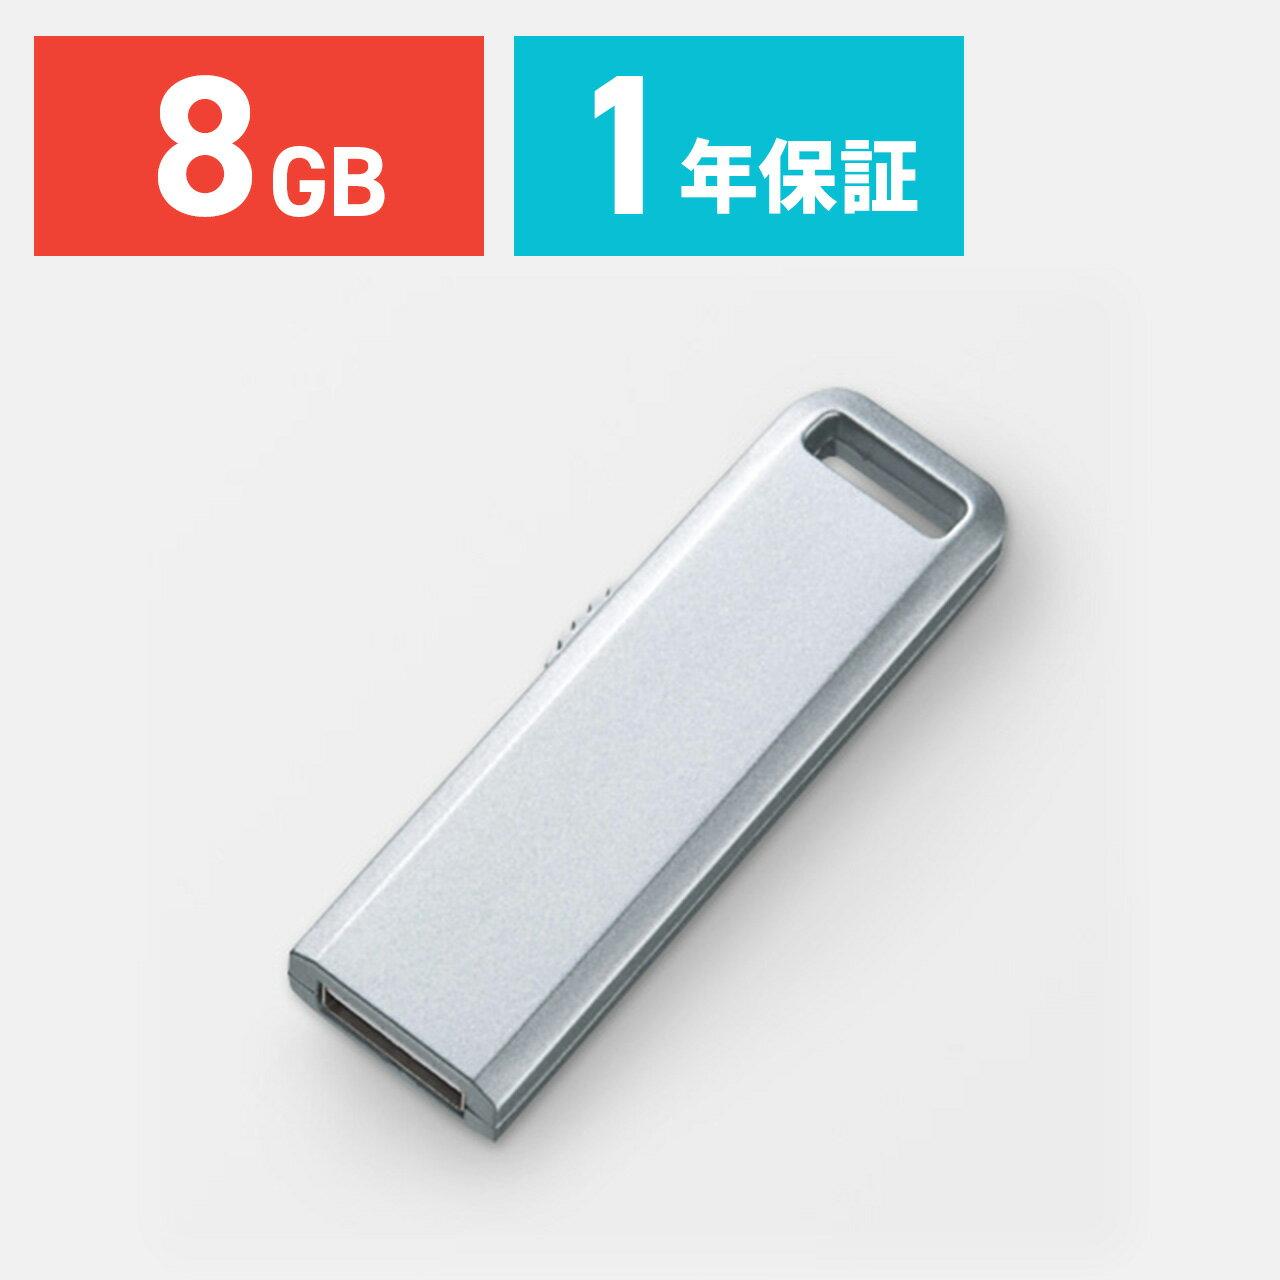 USBメモリ 8GB シルバー スライドタイプ USBメモリー [600-UL8GSV]【サンワダイレクト限定品】【ネコポス対応】【楽天BOX受取対象商品】